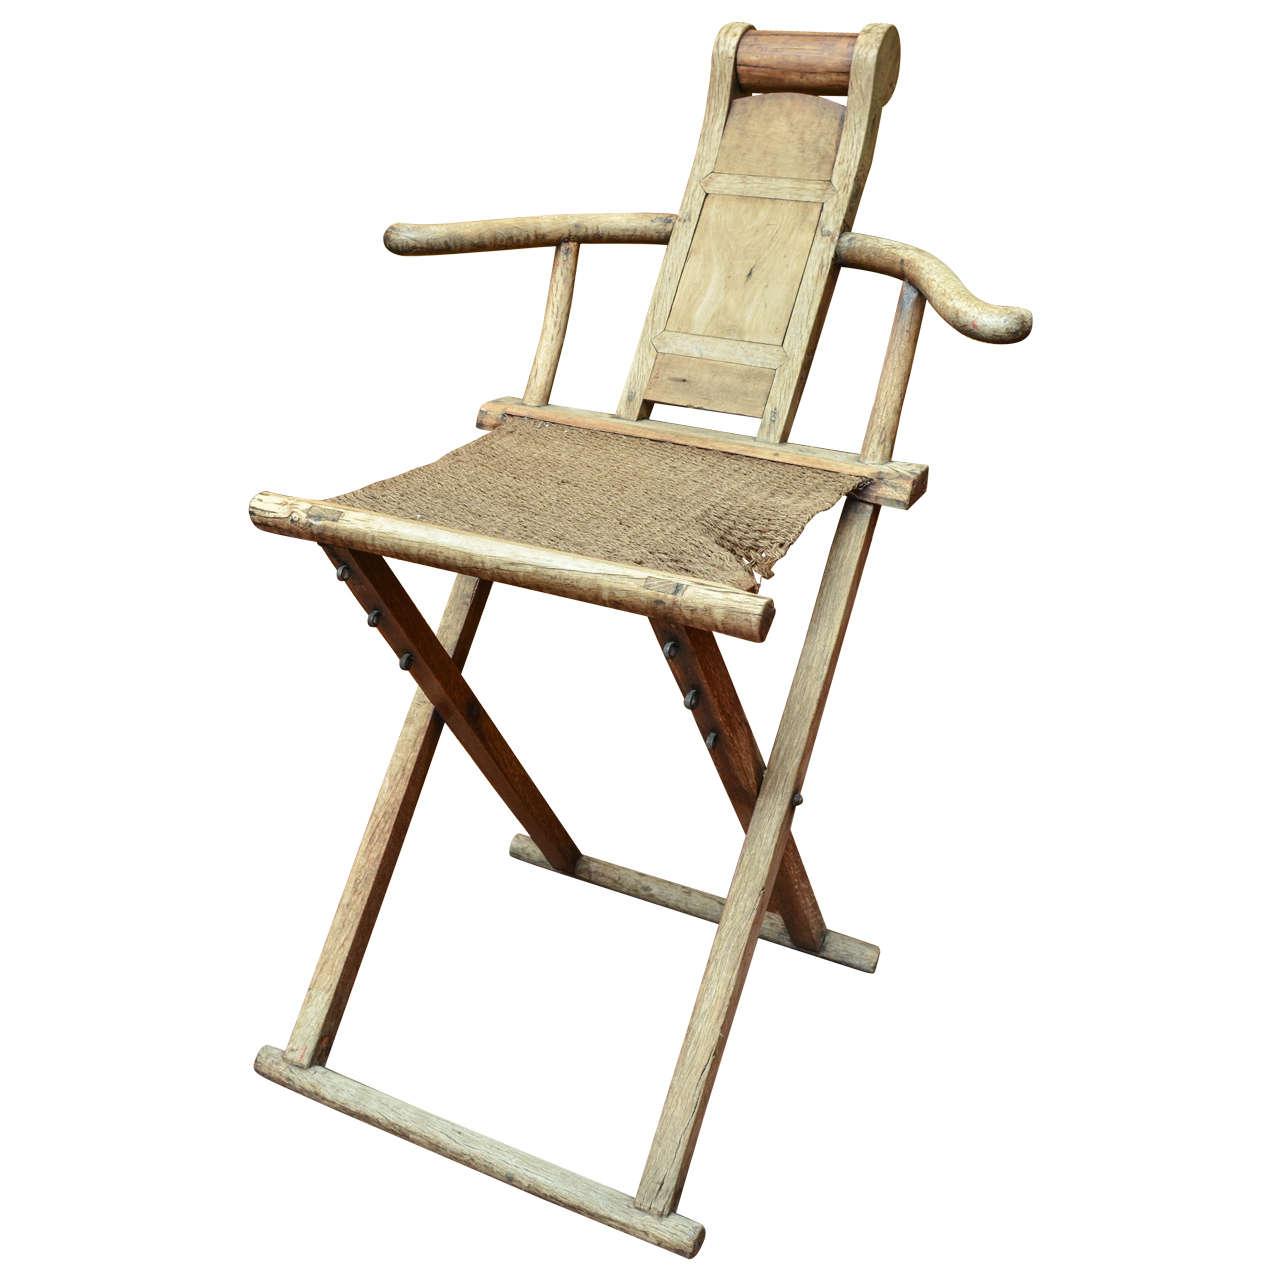 Late 18th Century Qing Dynasty Walnut Folding Campaign Form Scholar's Chair